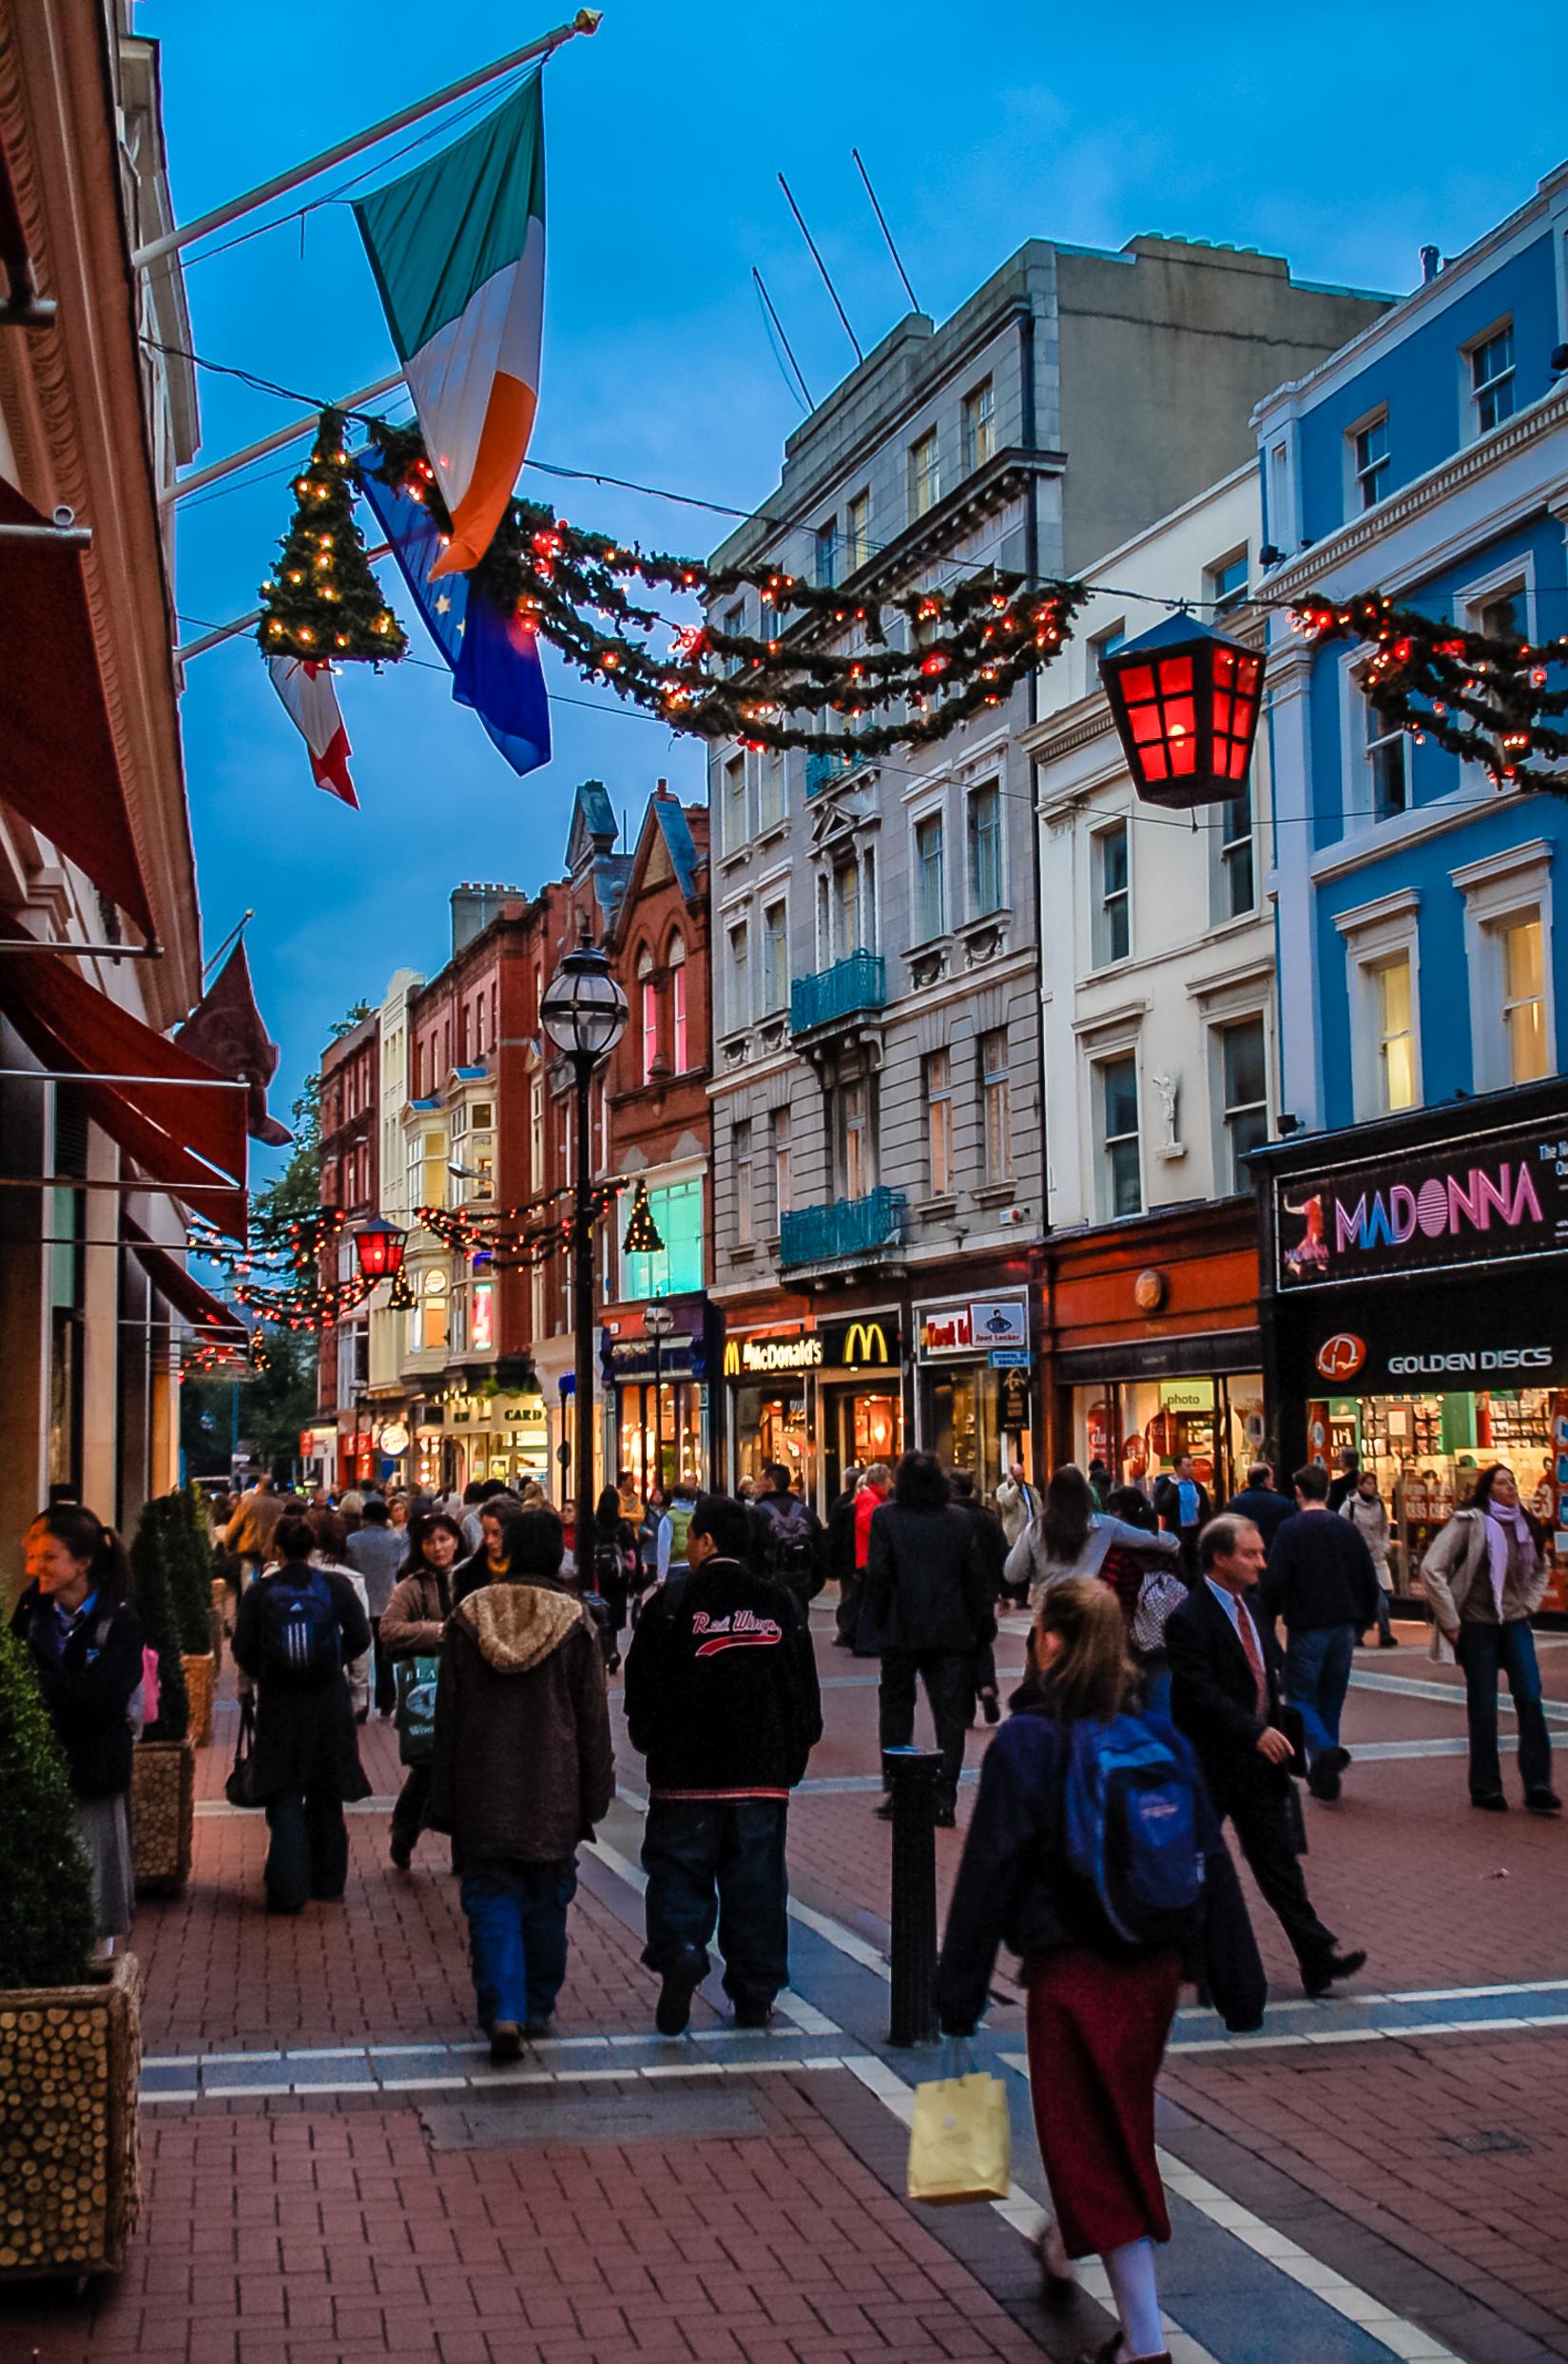 Dublin, Ireland - November 15, 2005: People wander along Grafton Street in Dublin, Ireland. Grafton Street is the main pedestrian street in Dublin and is full of shops, pubs and restaurants.